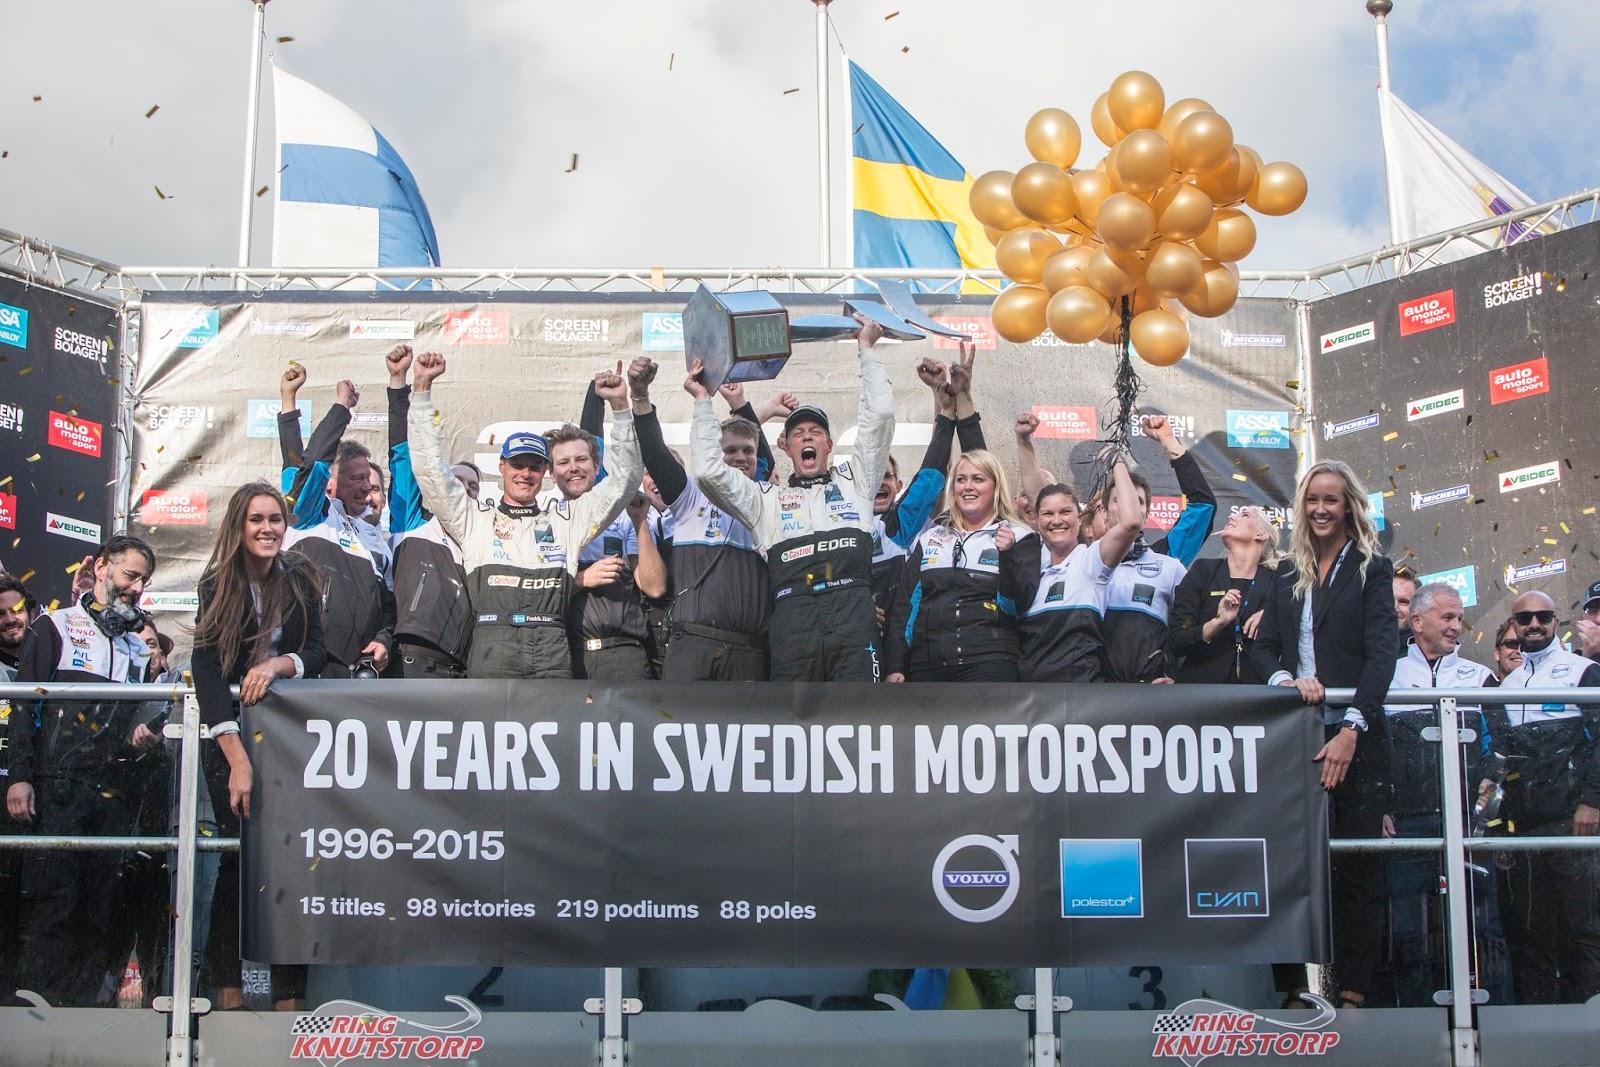 VOLVO POLESTAR%2BCYAN%2BRACING%2BWINS%2BSTCC Η Volvo στο WTCC με το S60 Polestar για να γιορτάσει το ένδοξο παρελθόν του Volvo 240 Turbo